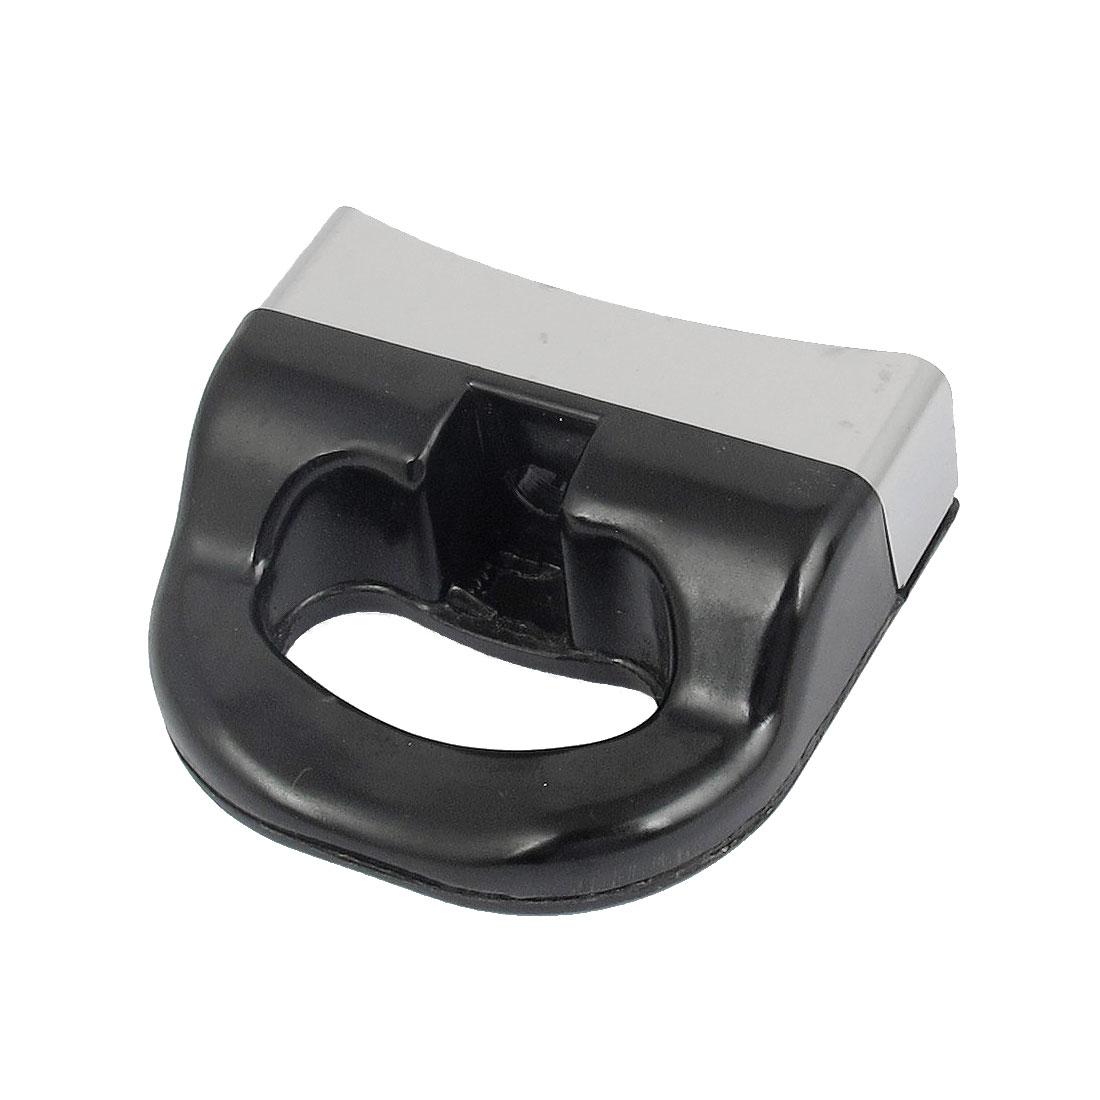 Kitchen Black Plastic Pressure Cooker Pot Pan Holder Handle Grip Handgrip